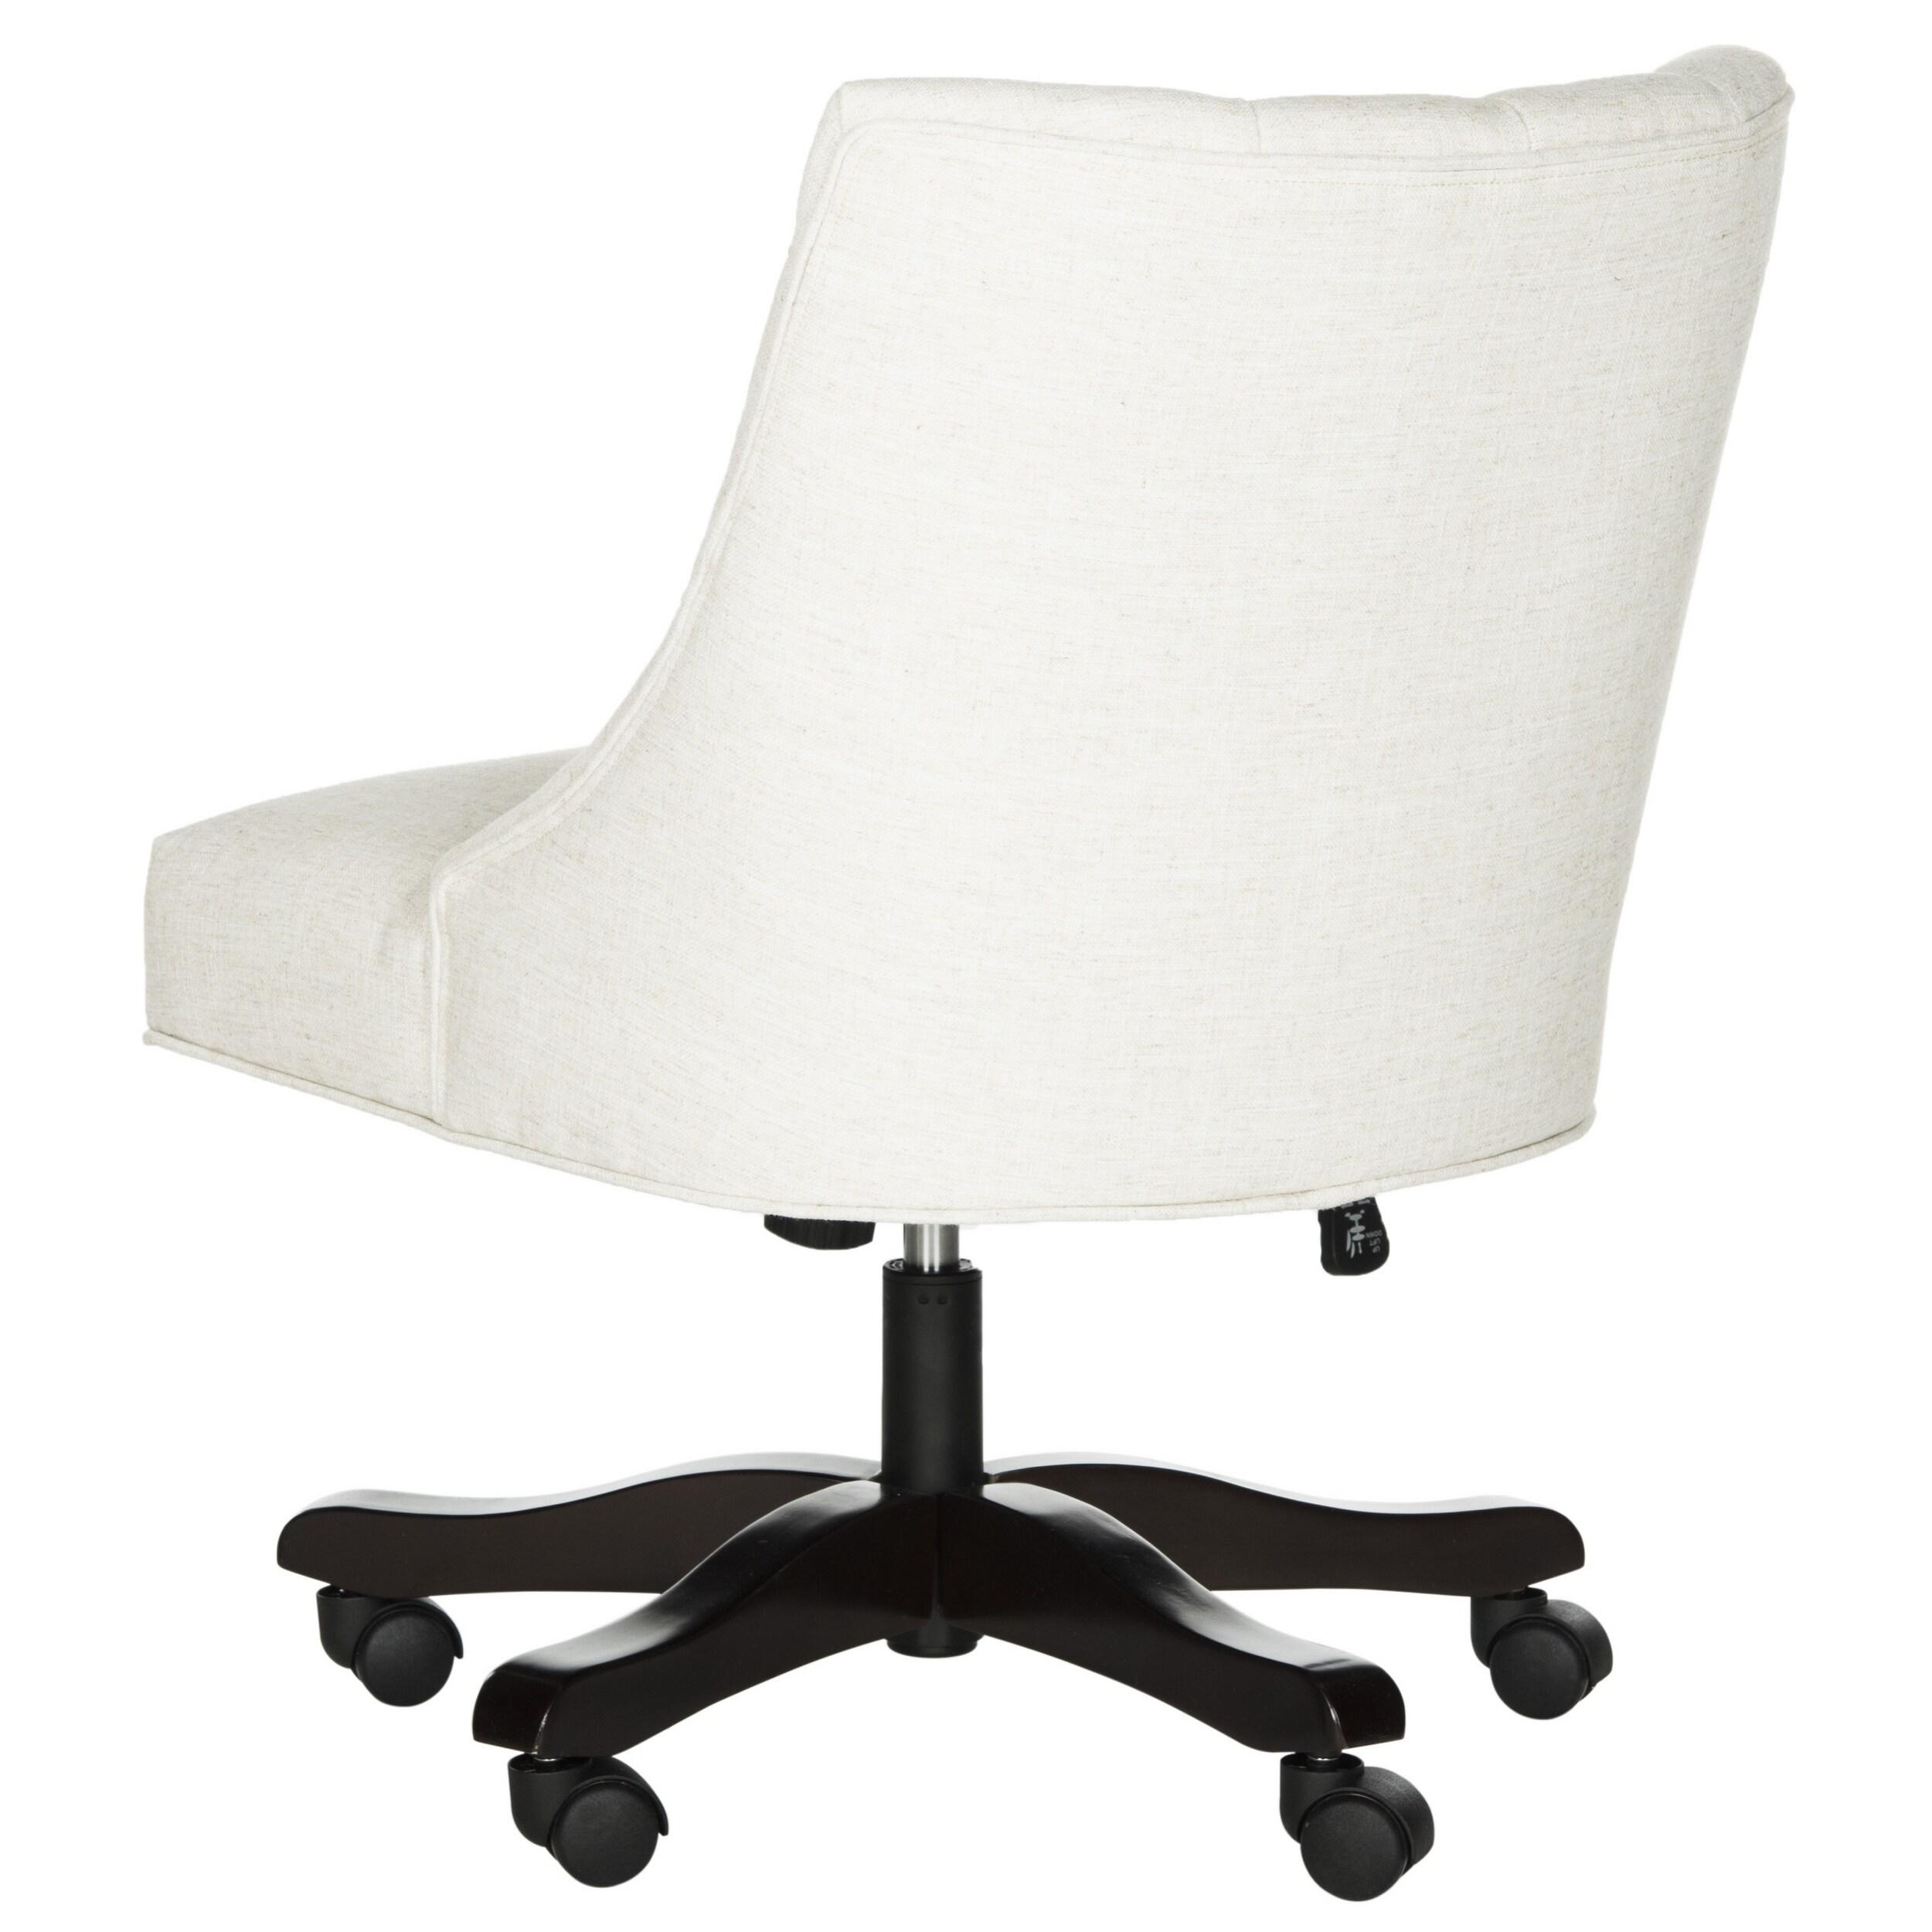 Safavieh Soho Swivel Light Cream Desk Chair Free Shipping Today 14430201